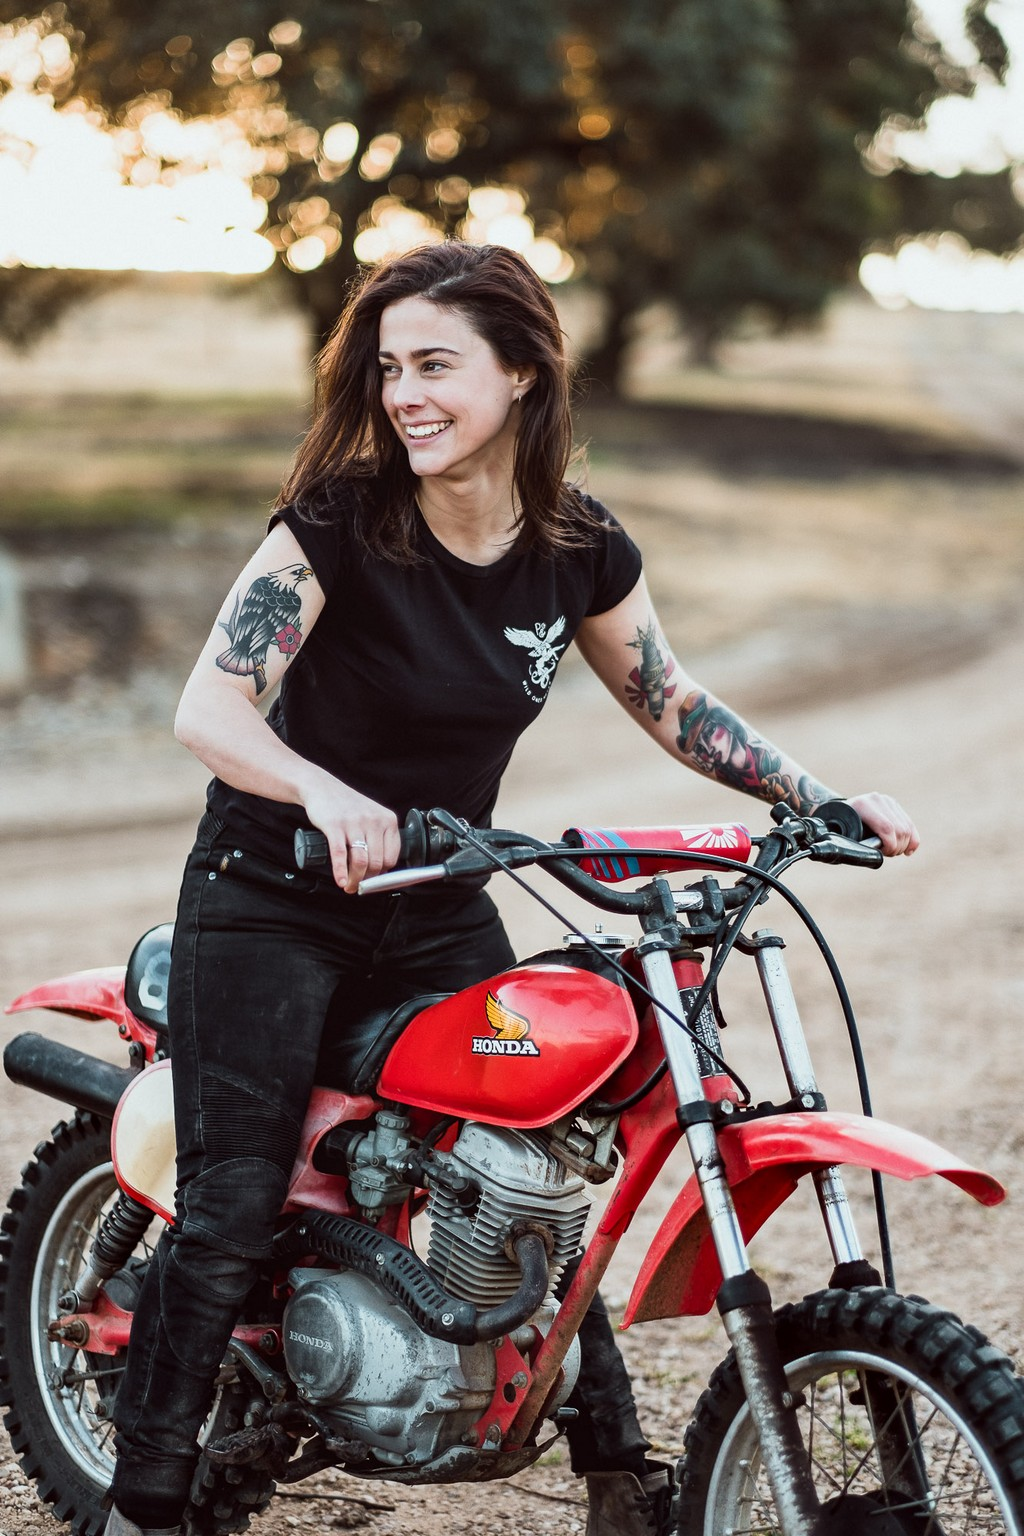 Katie Adbilla on a Honda XL motorcycle in Tasmania